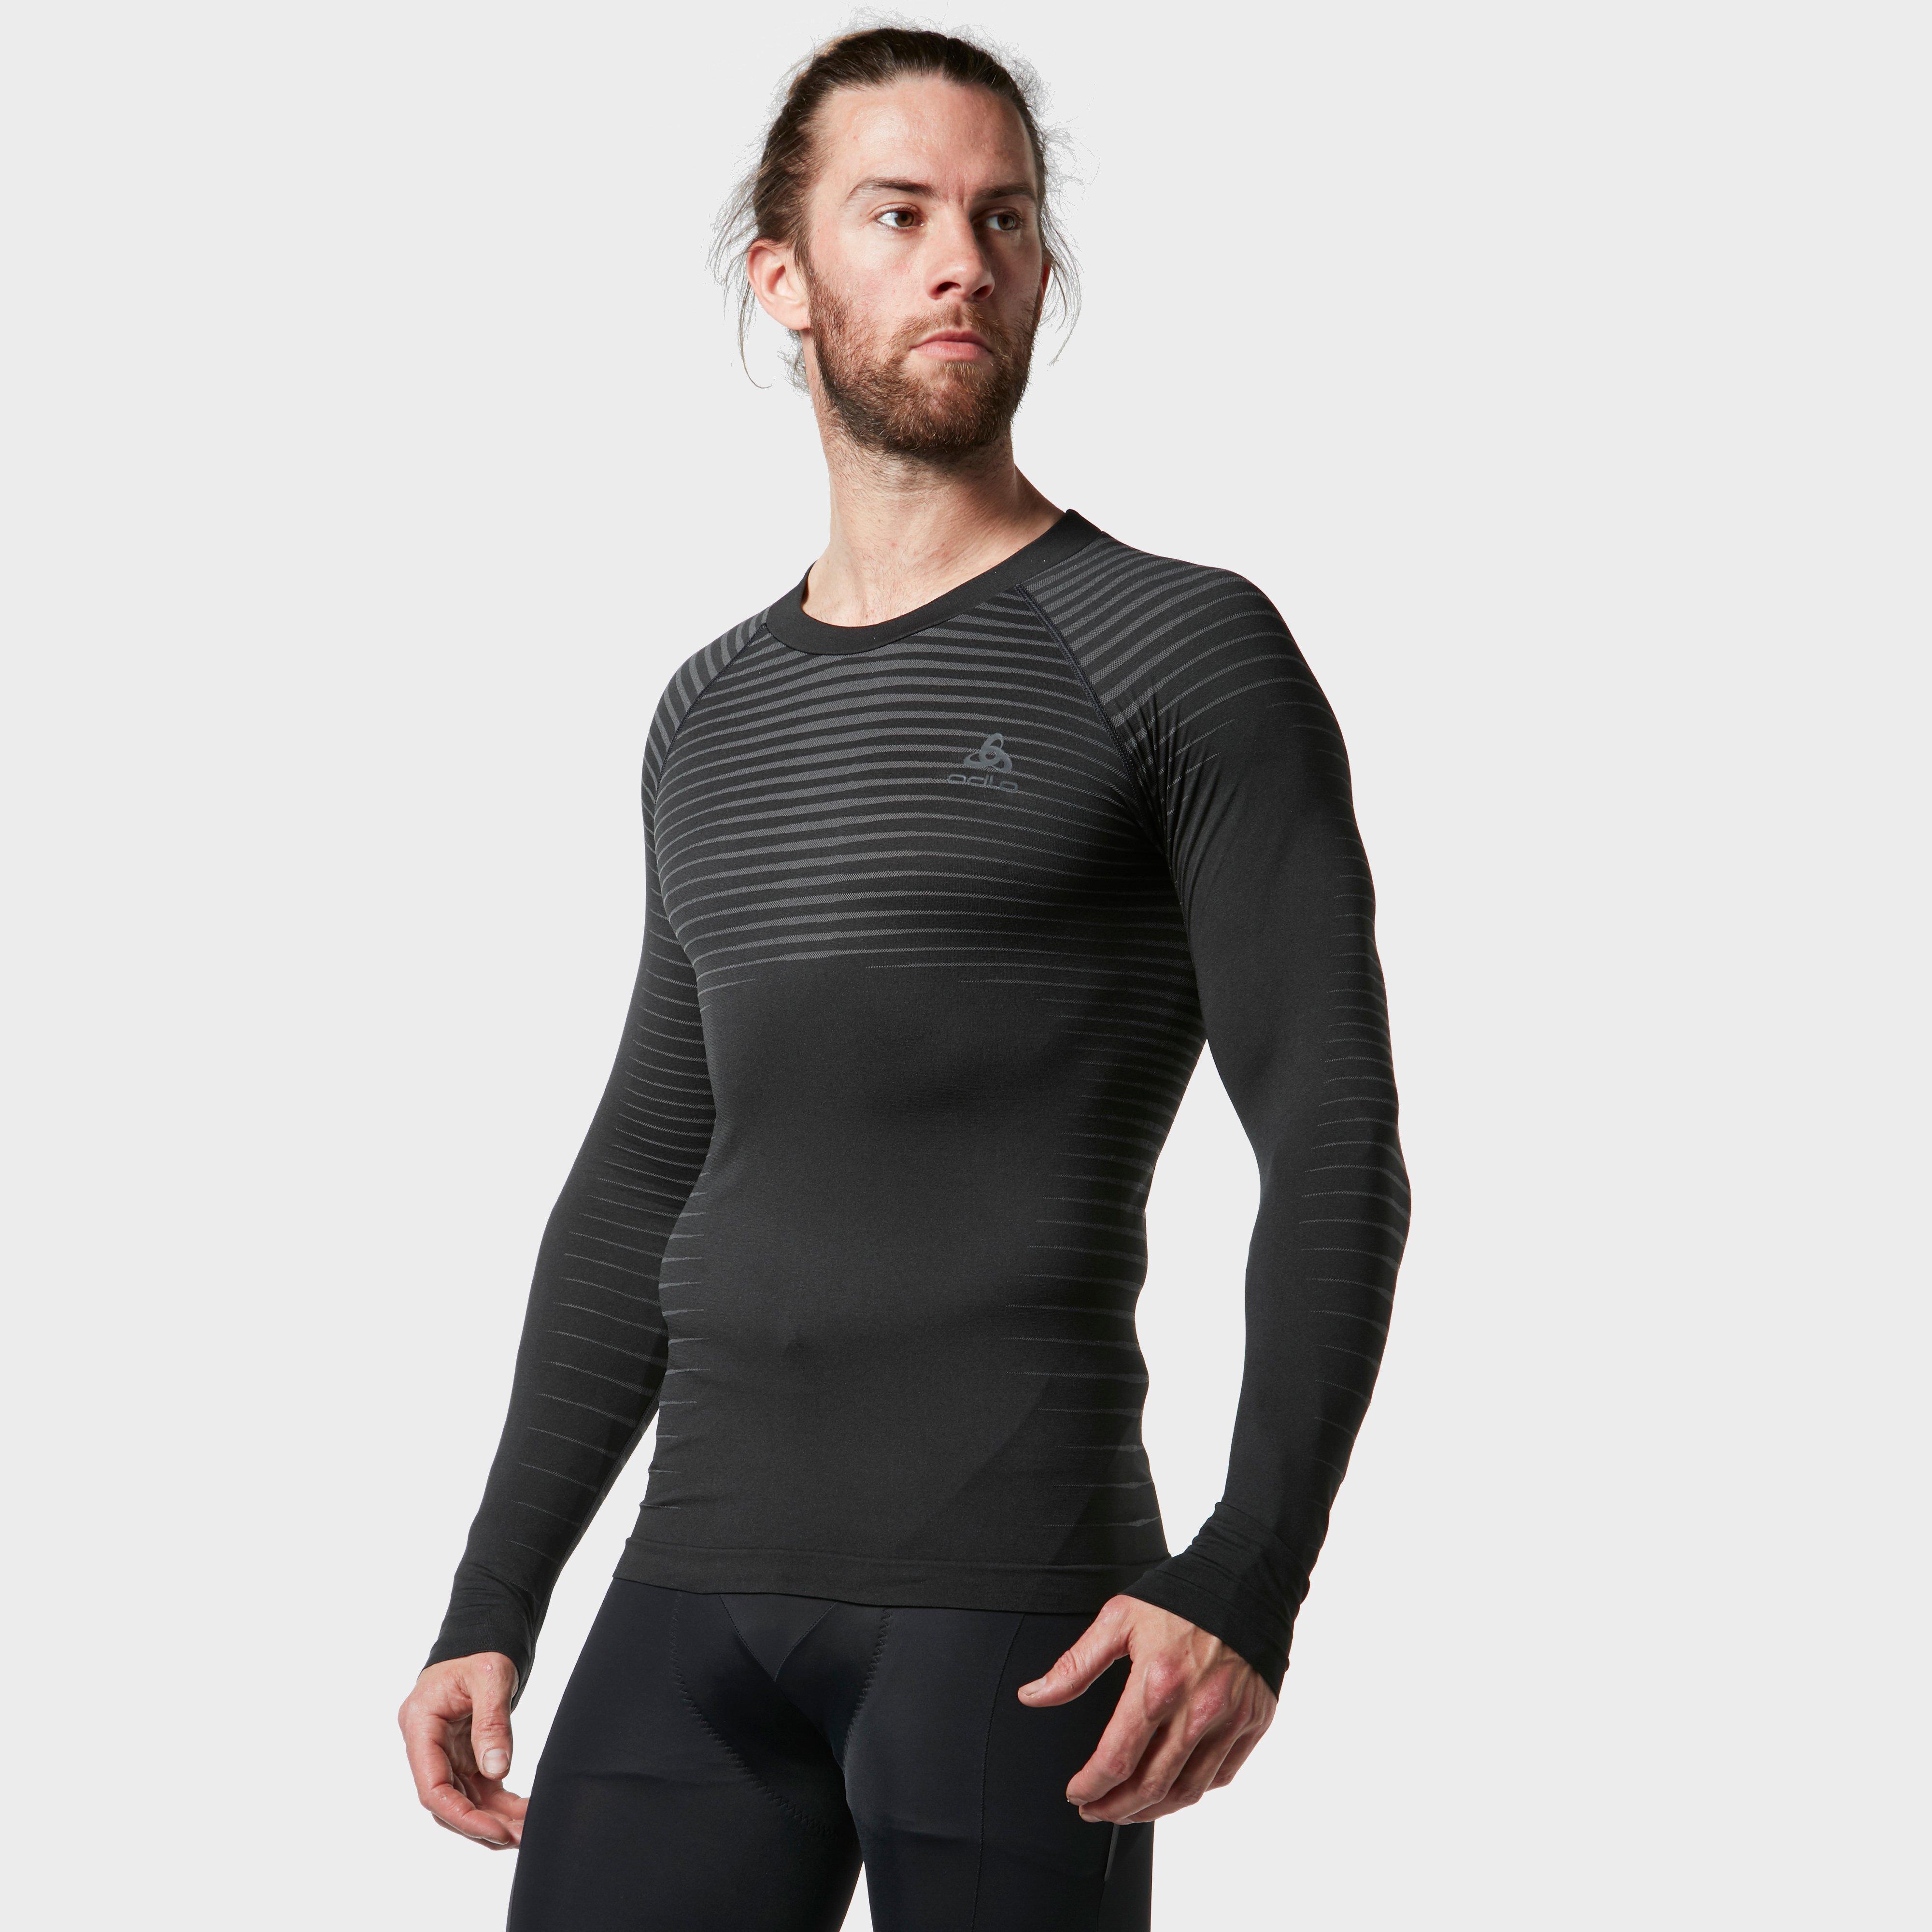 Odlo Odlo Mens Performance Light Long Sleeve Top - Black, Black